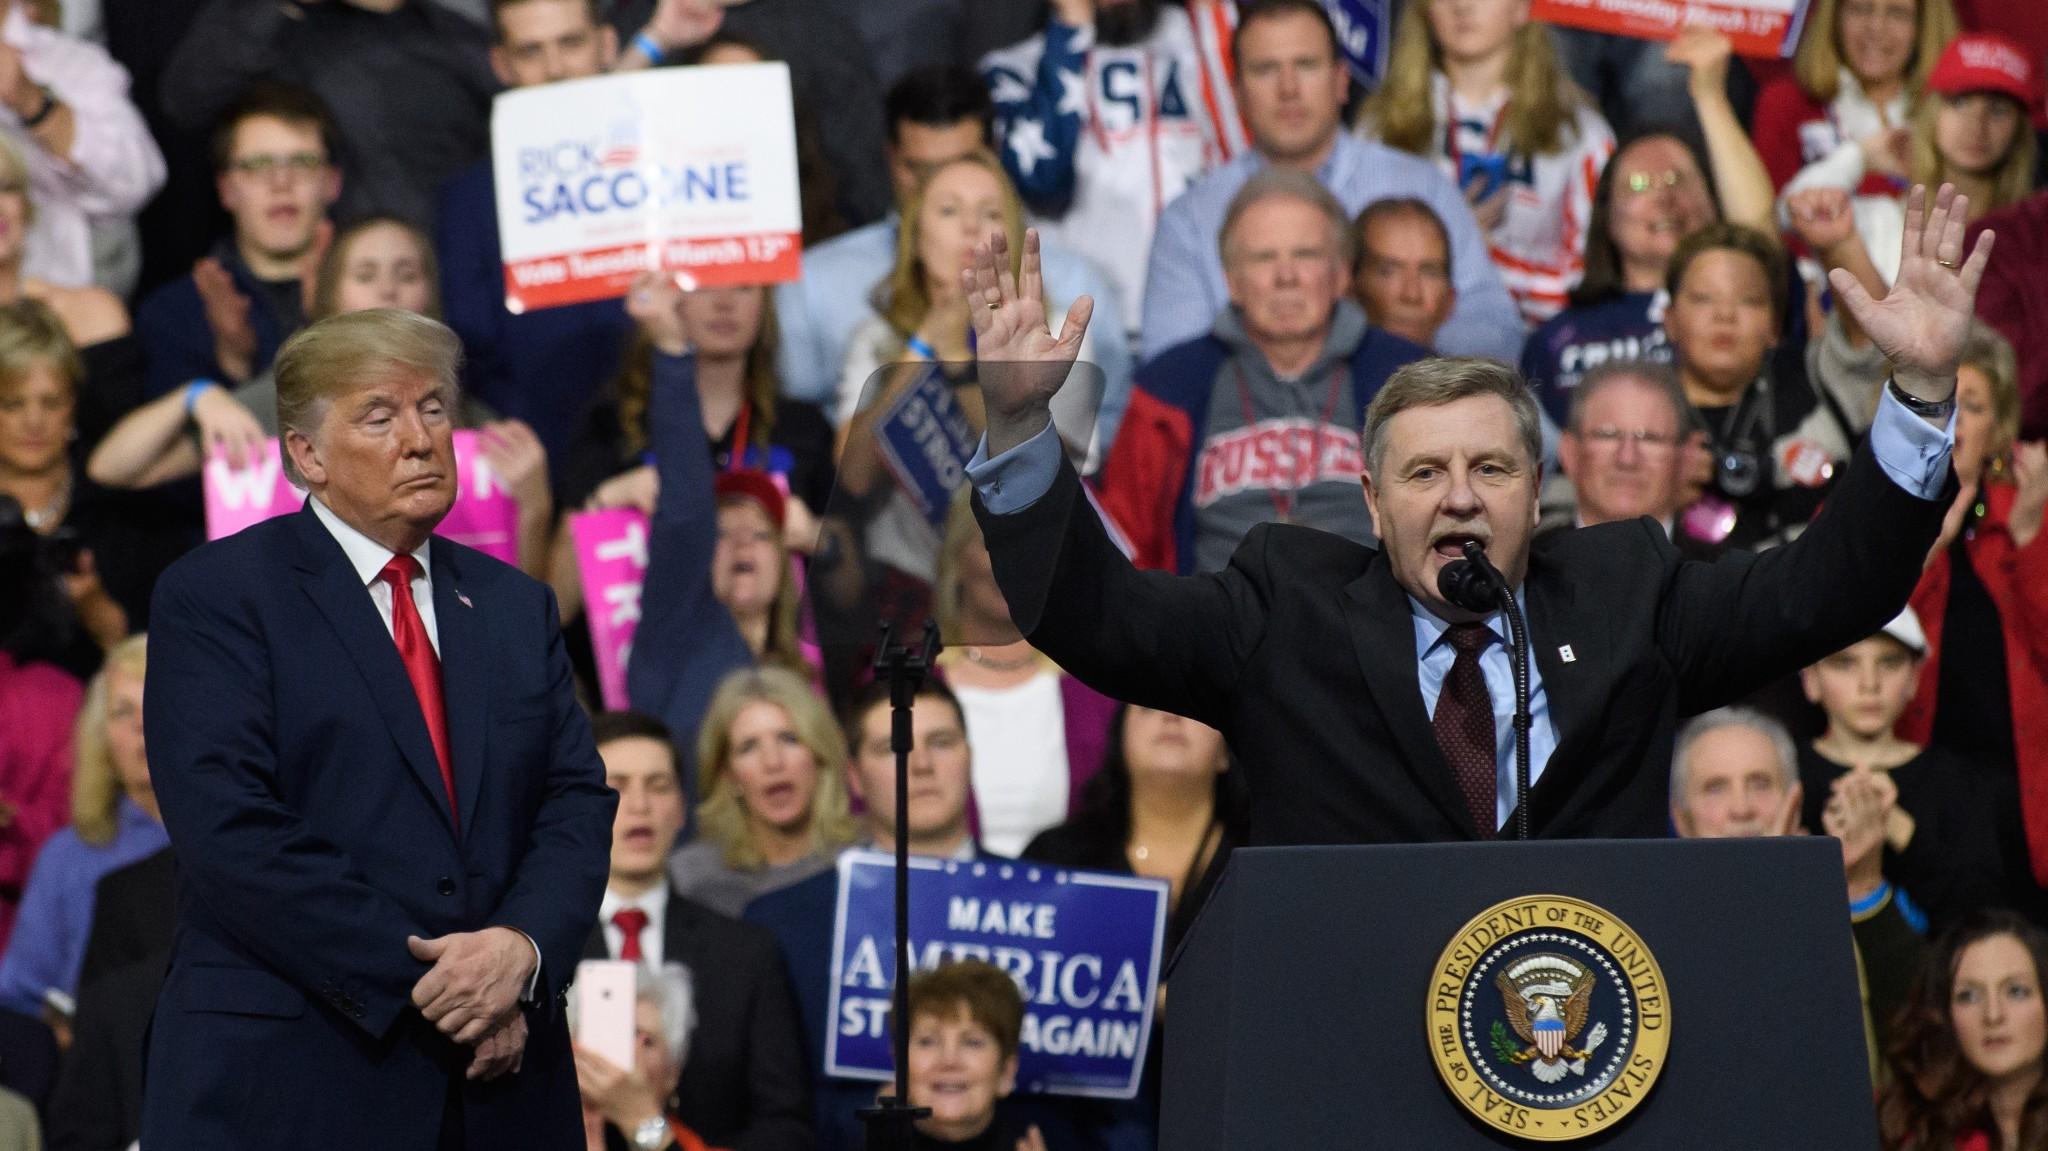 Trump In Pennsylvania: I Need Rick Saccone To Help 'Keep America Great!'